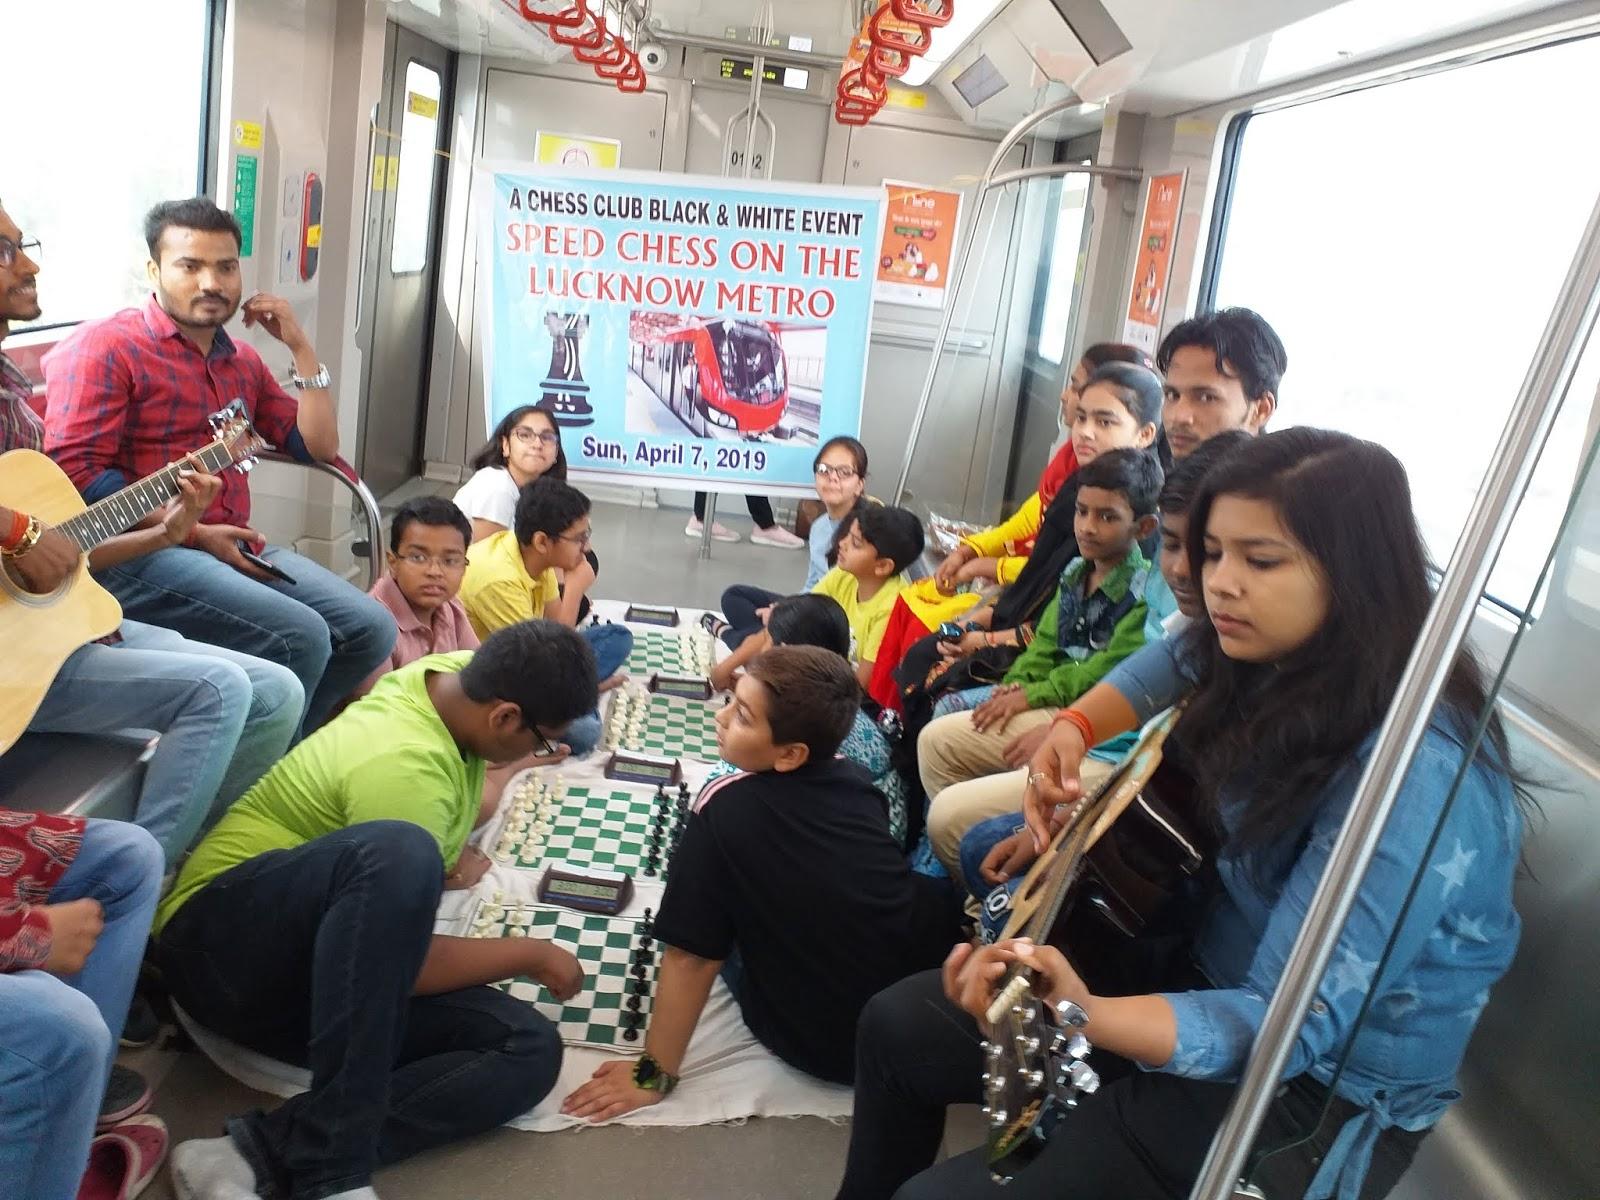 Aryan Singh wins Speed Chess on Running Lucknow Metro